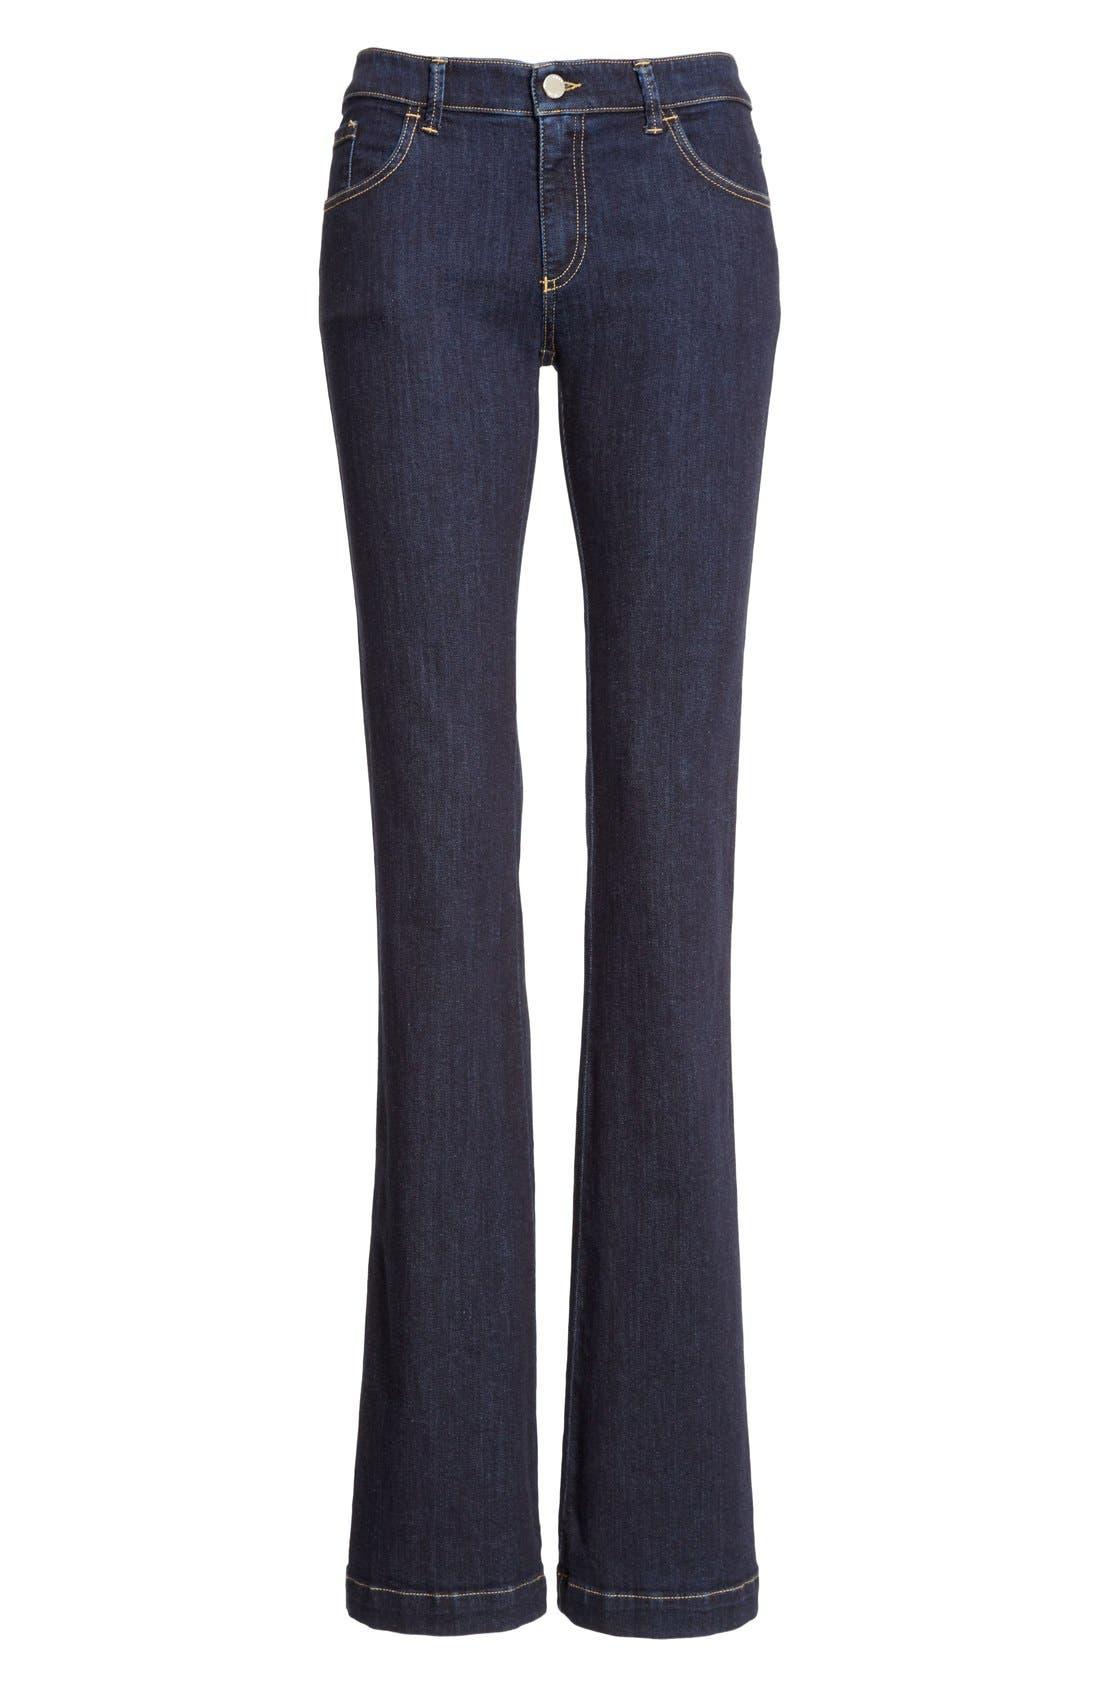 Armani Jeans Bootcut Jeans,                             Alternate thumbnail 3, color,                             400